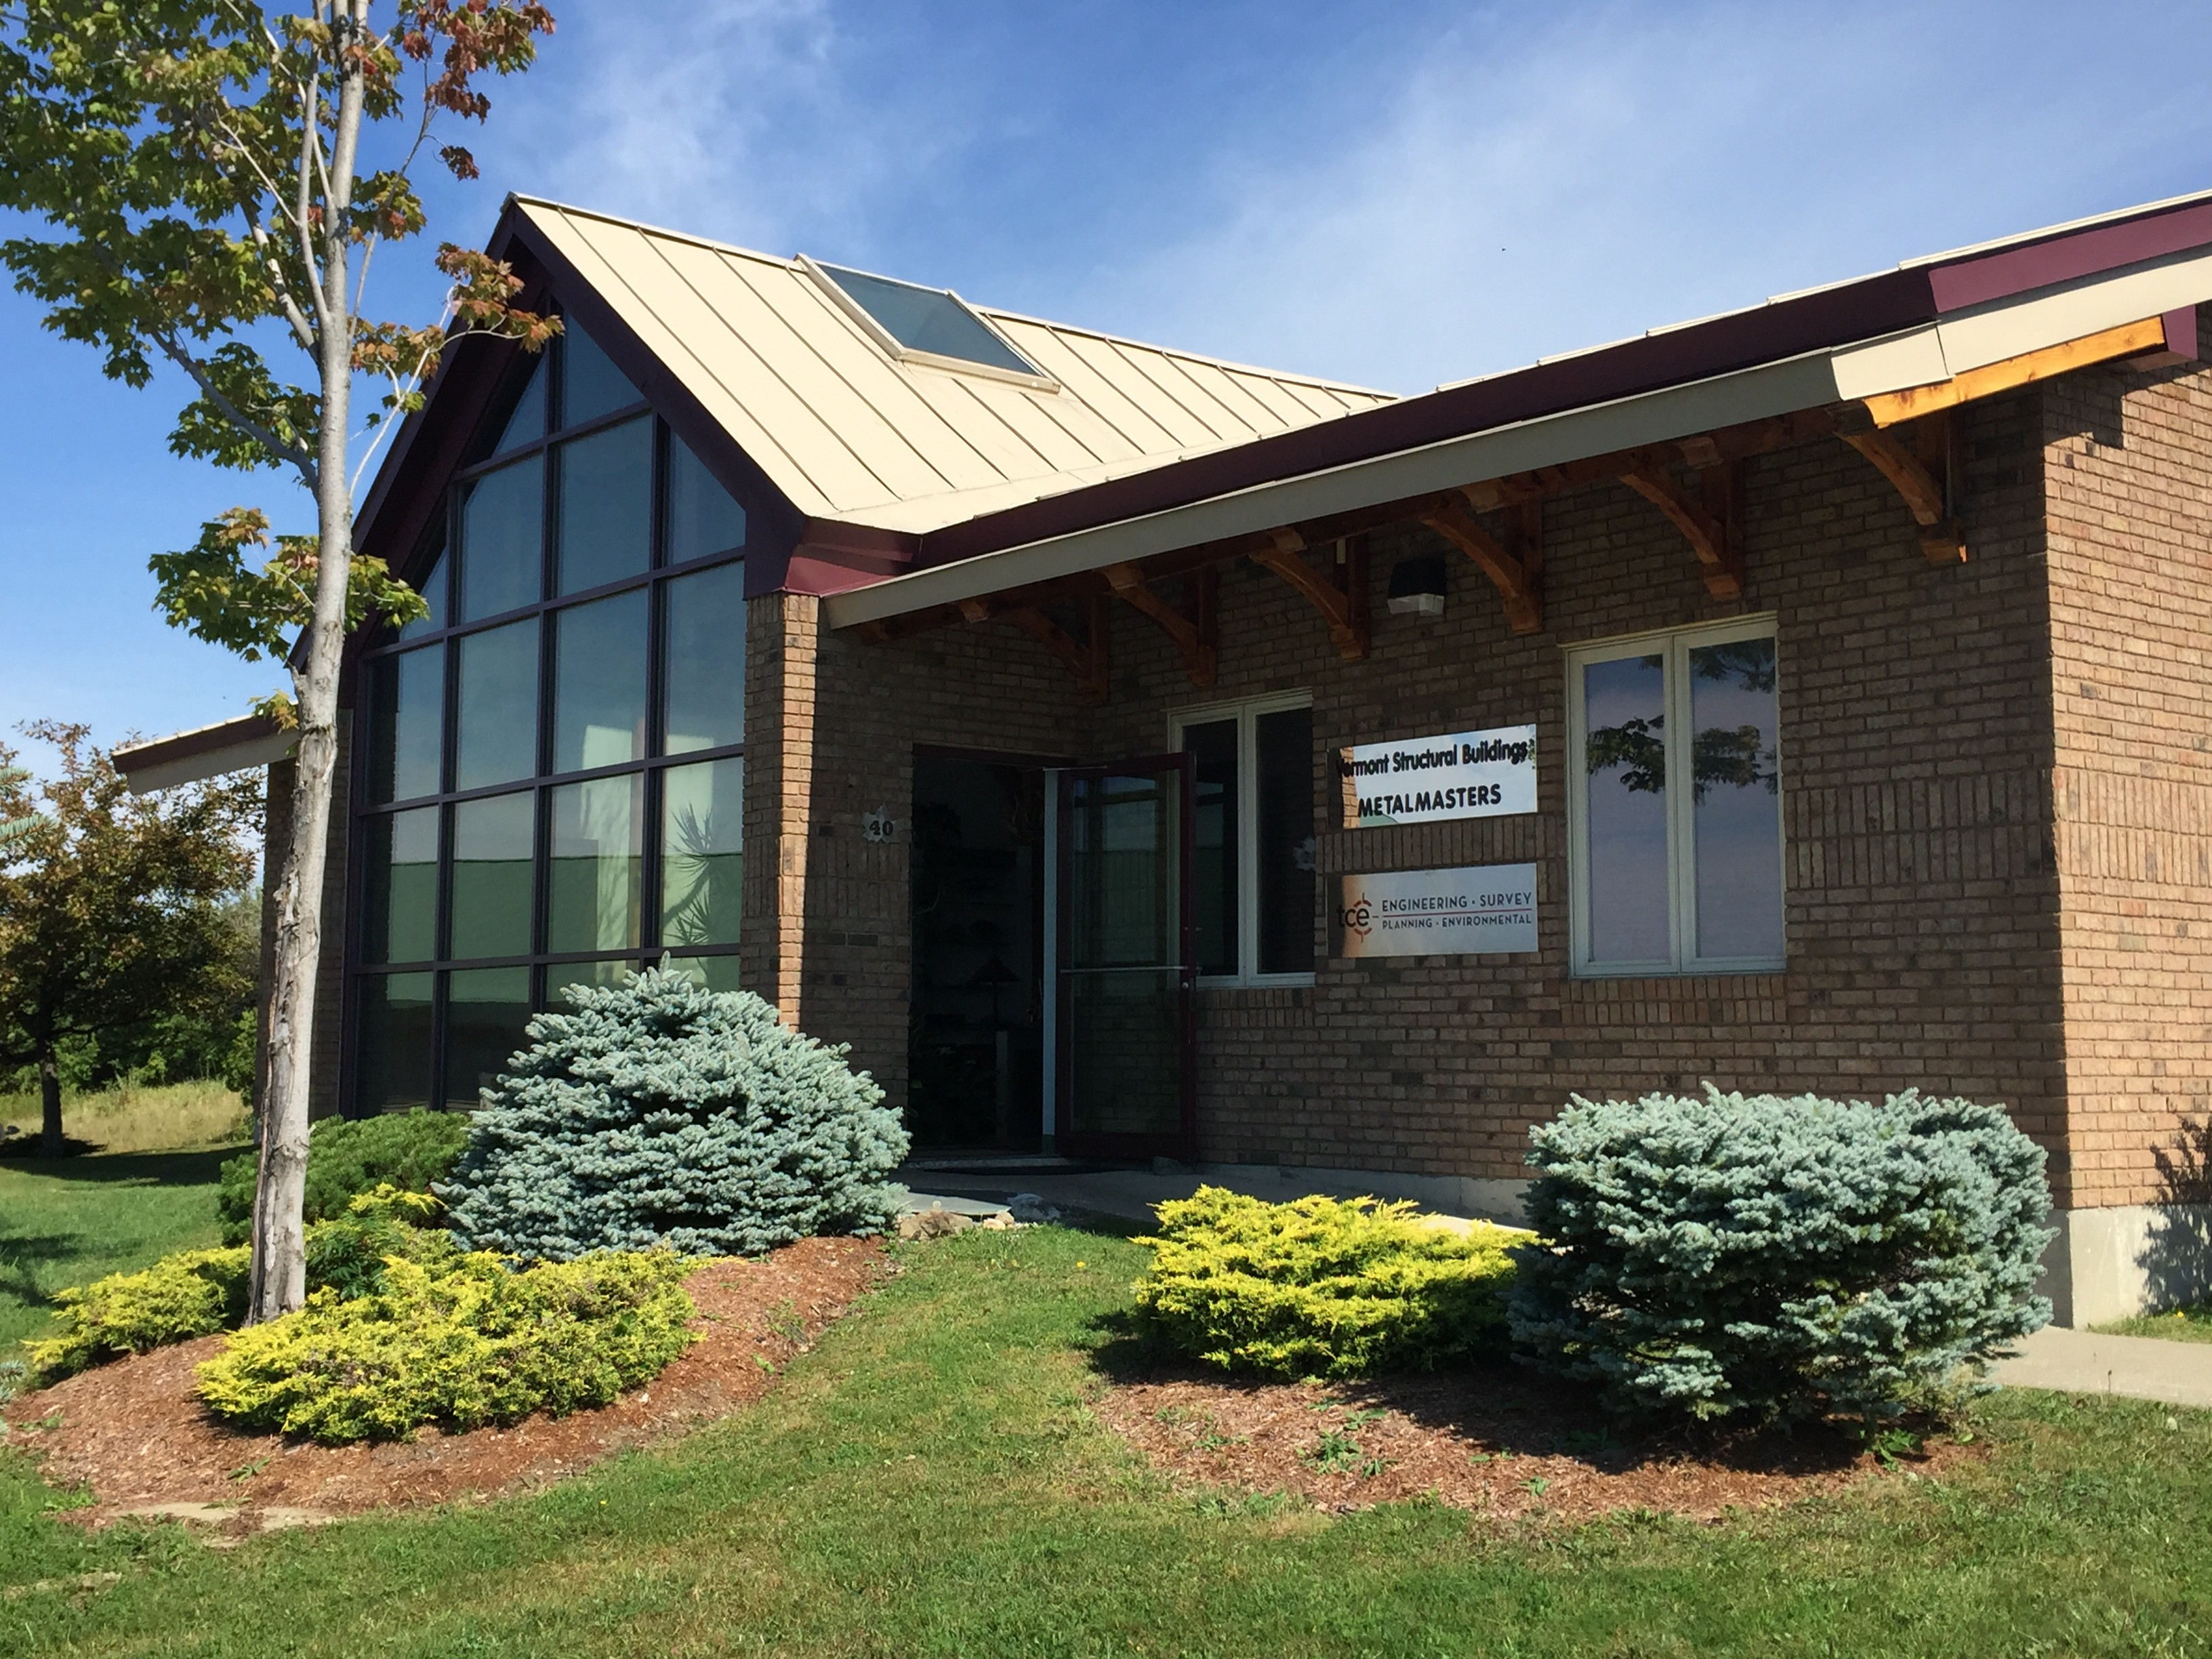 42 Mapleville Depot